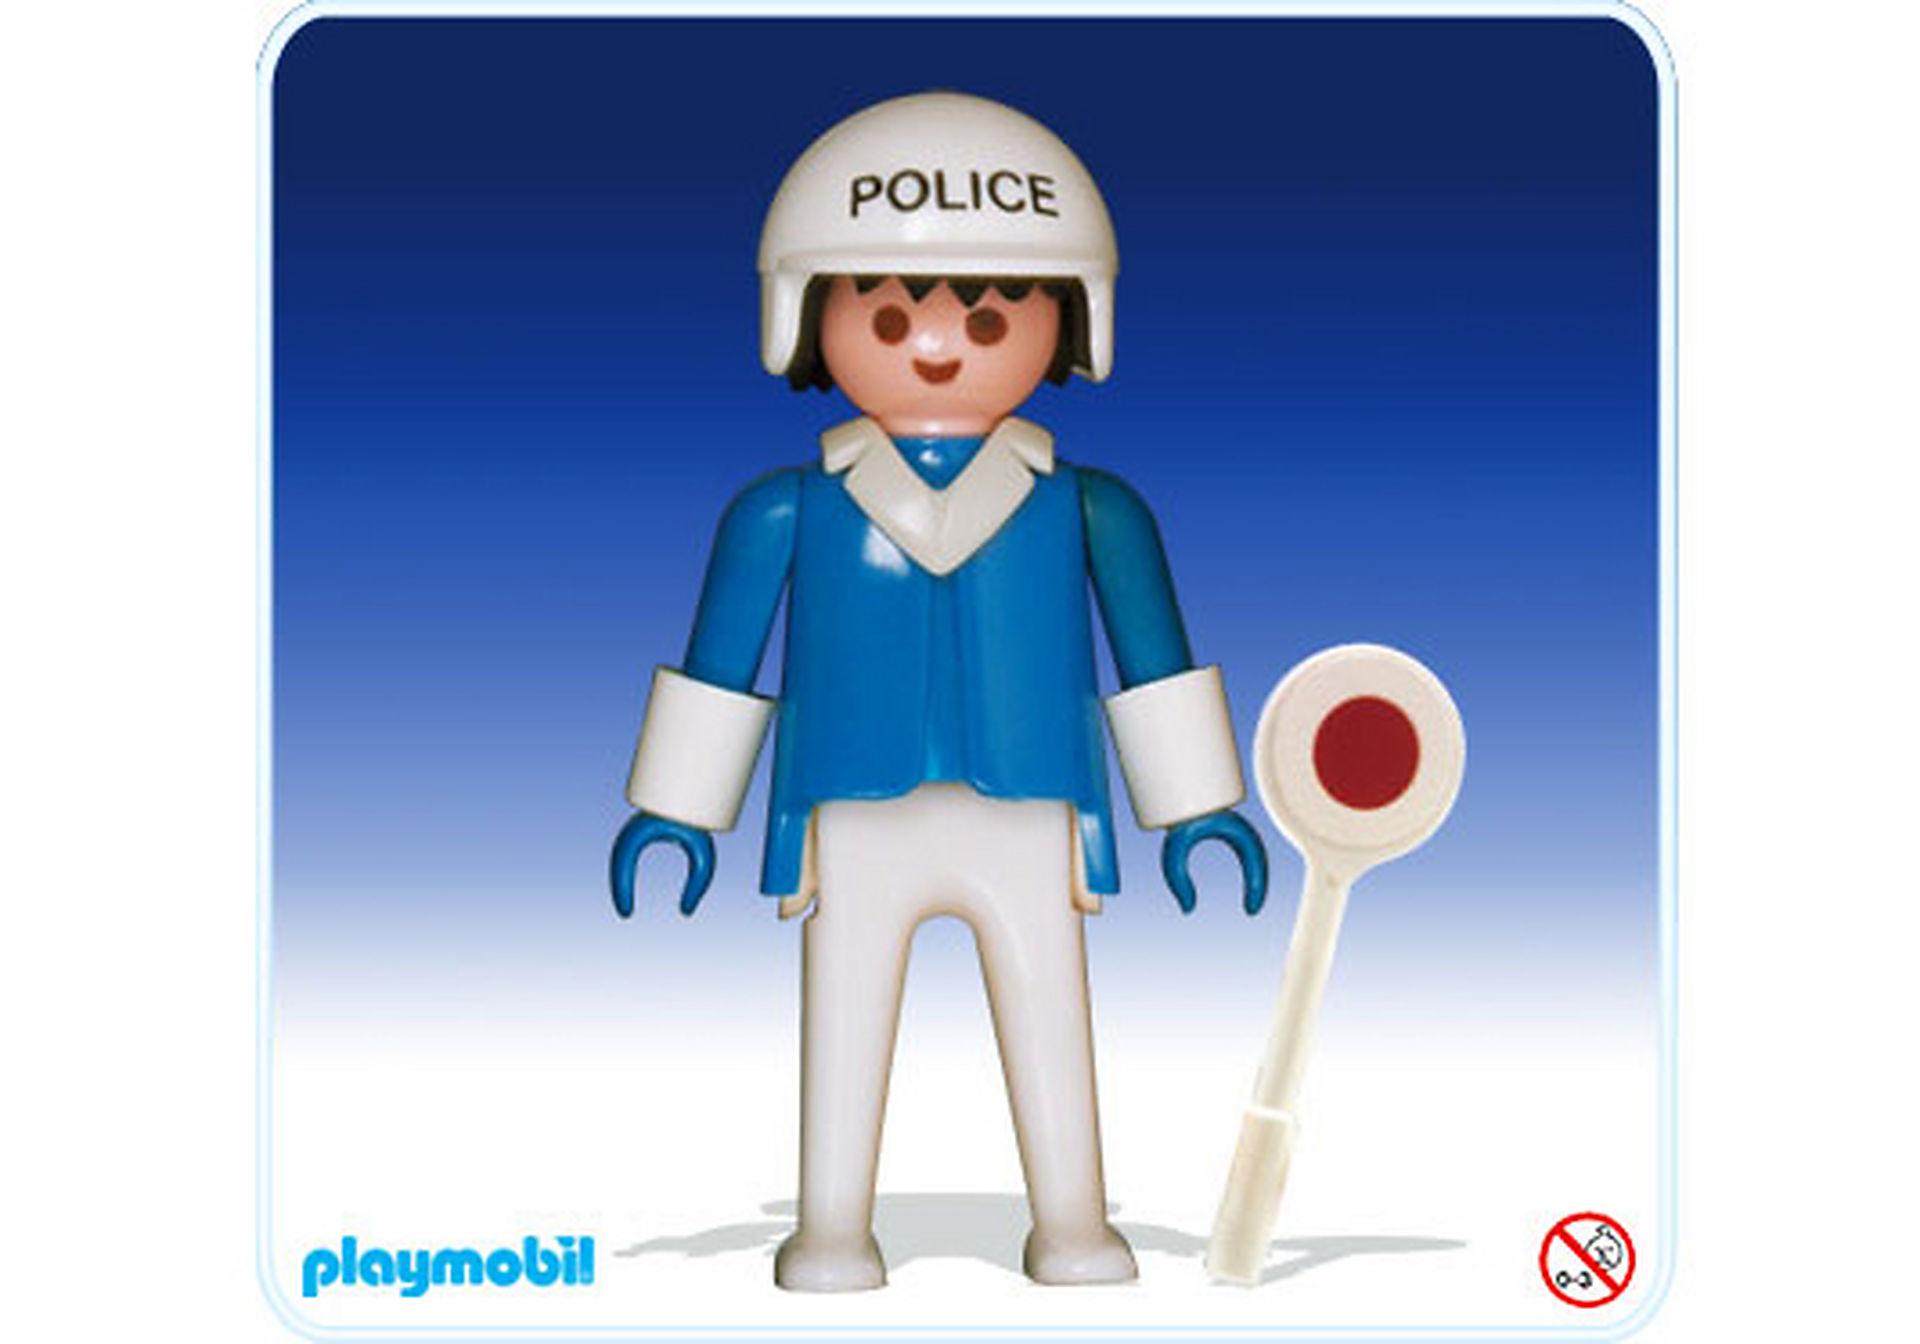 http://media.playmobil.com/i/playmobil/3280-A_product_detail/Polizist